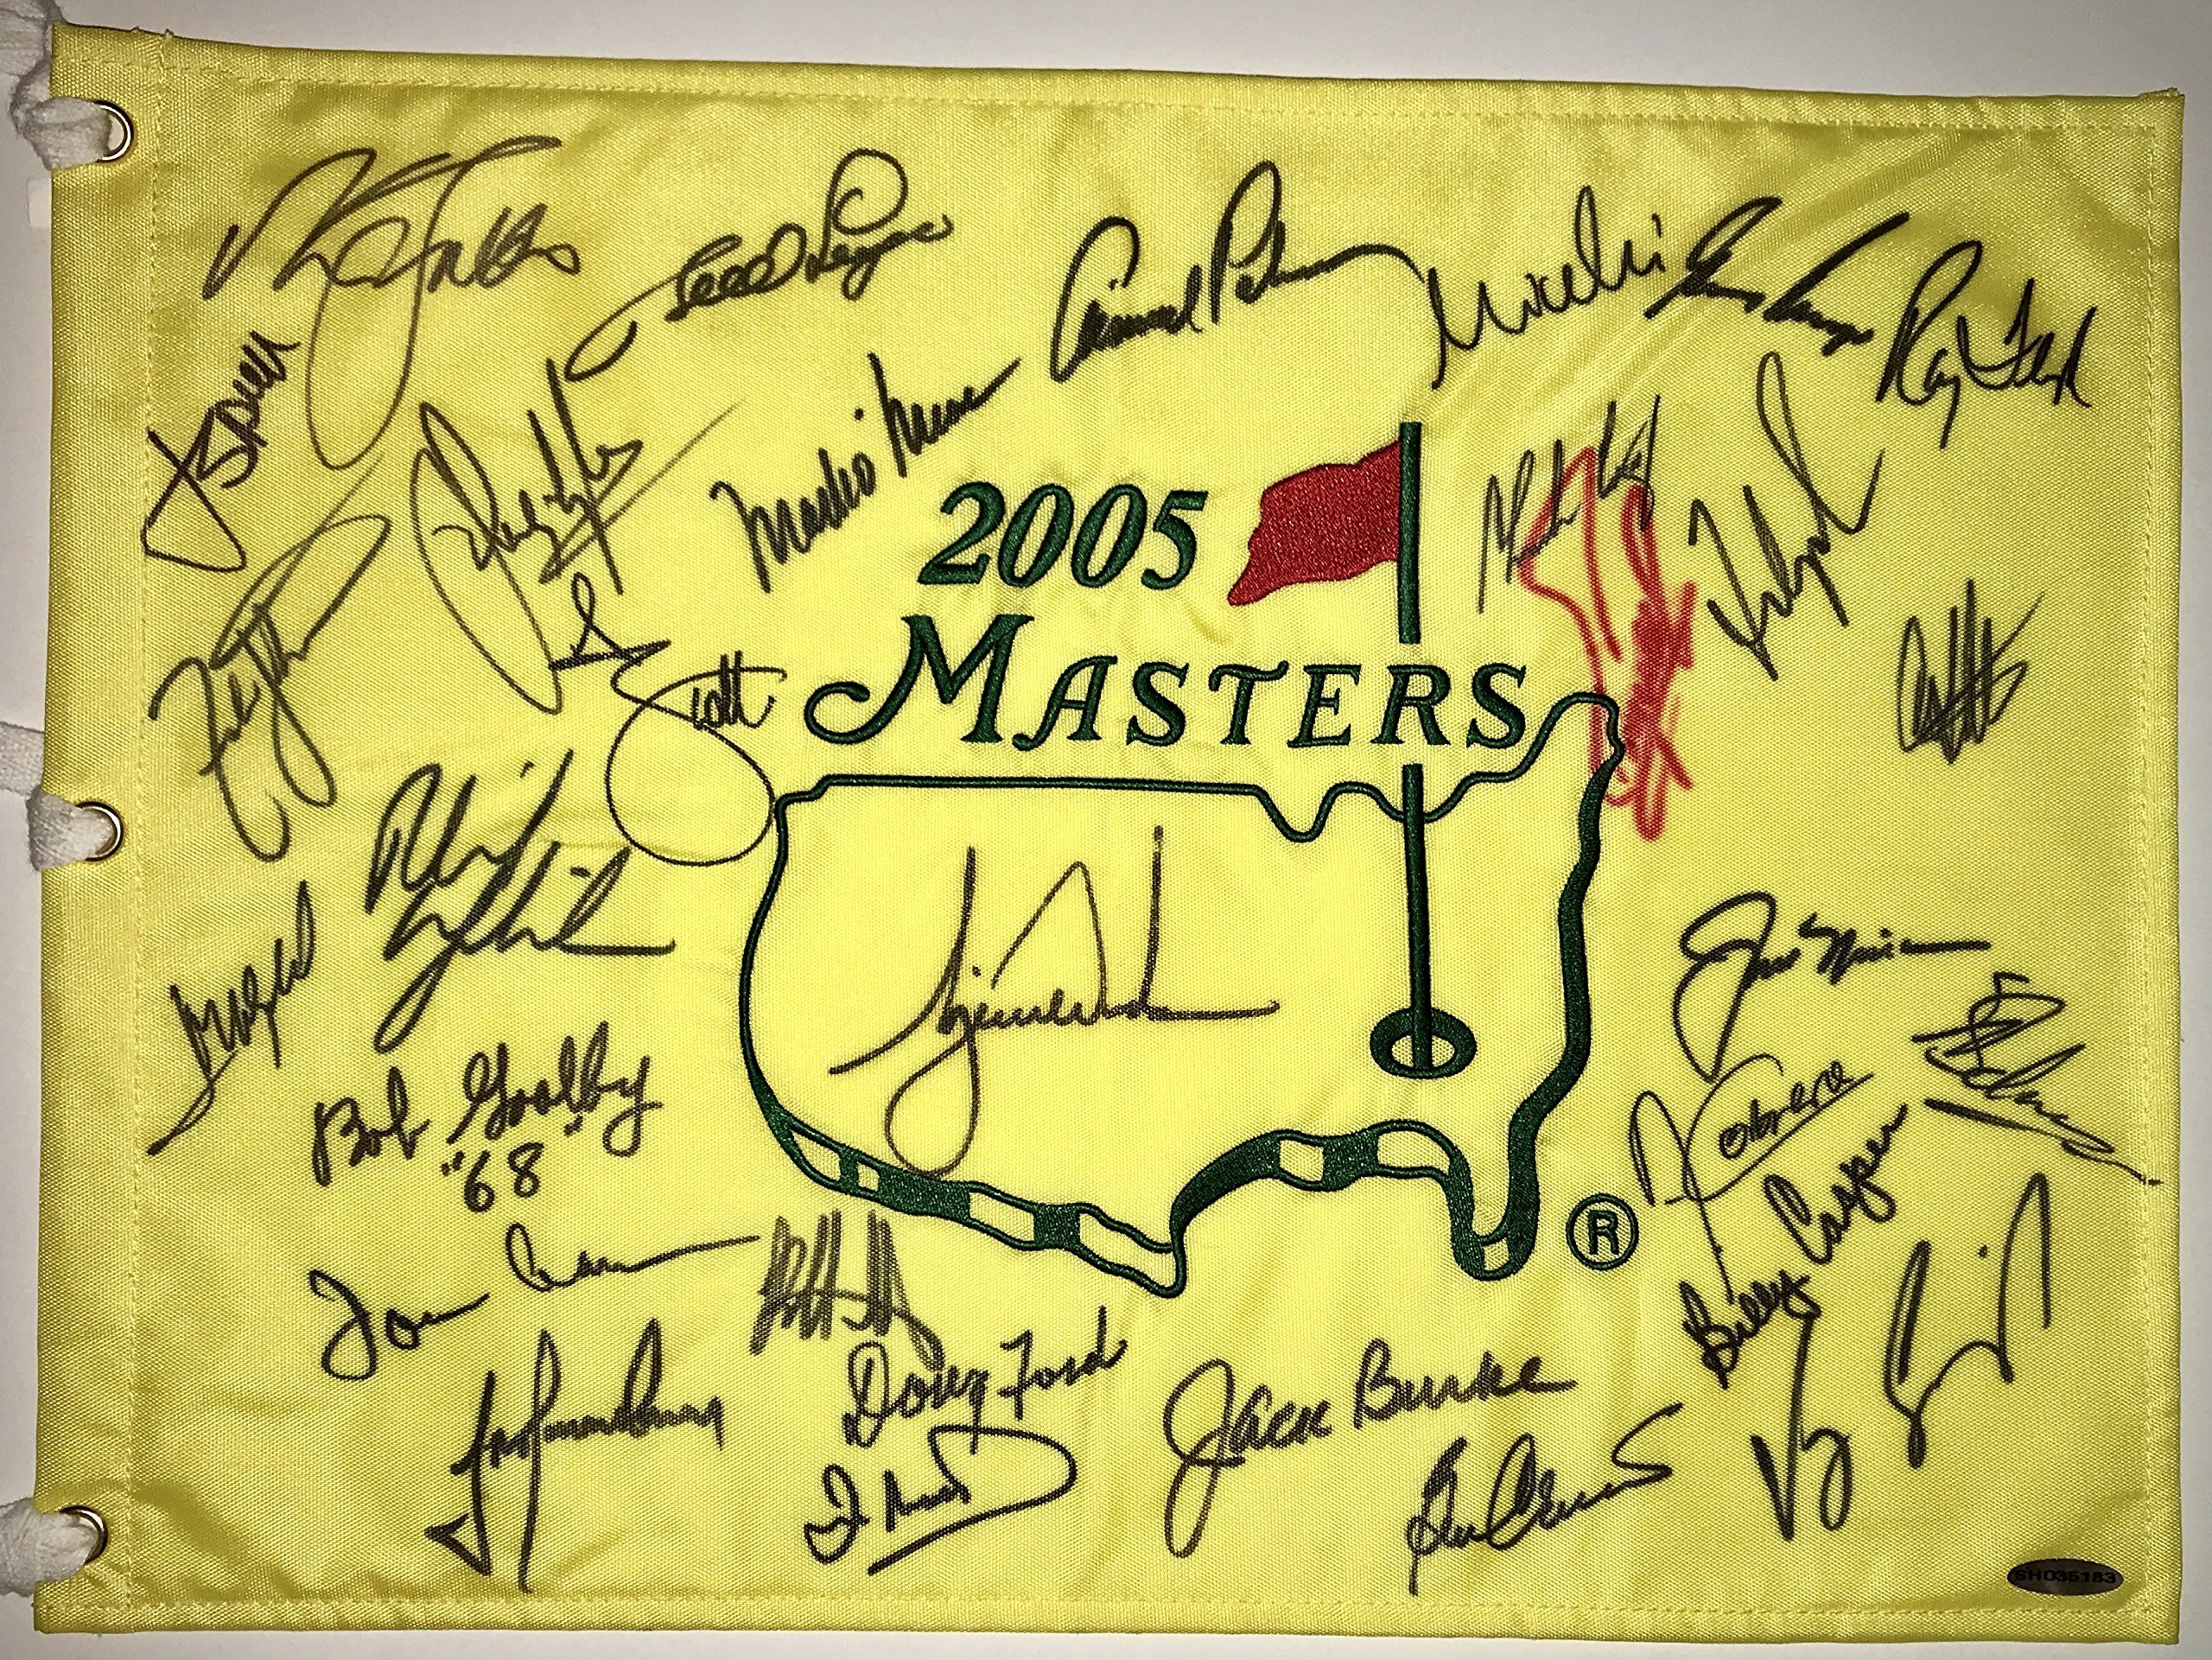 Jordan Spieth Tiger Woods Jack Nicklaus Arnold Palmer signed Masters champions flag augusta national psa dna loa